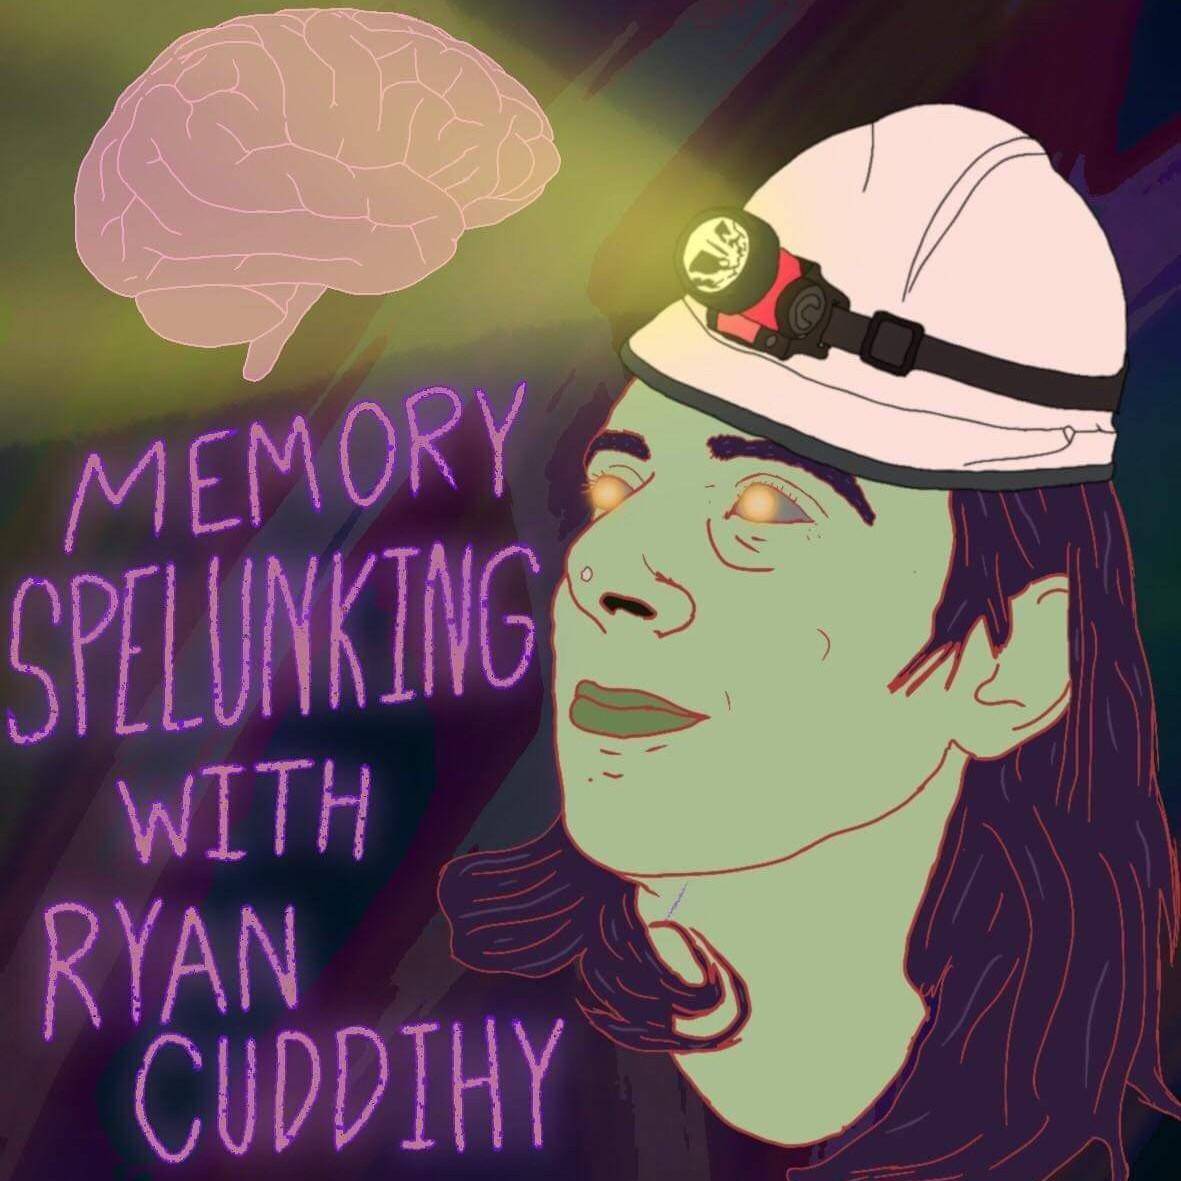 """Monkey Puke Mushroom"" Memory Spelunking with Ryan Cuddihy"